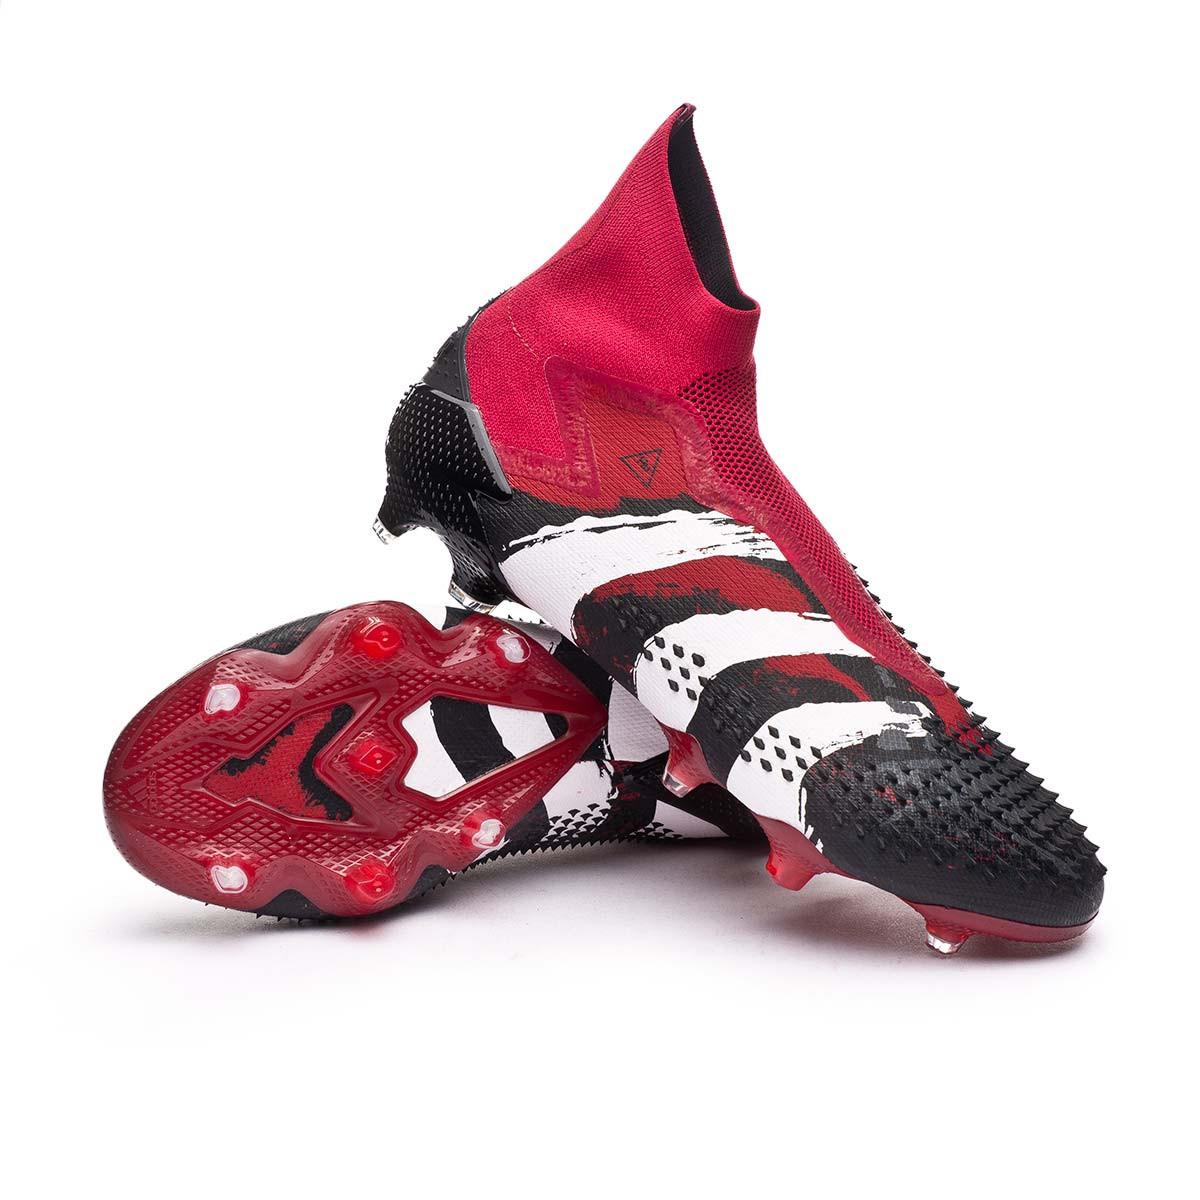 Medio Comedia de enredo plan de ventas  Football Boots adidas Predator Mutator 20+ FG Human Race True  red-White-Black - Football store Fútbol Emotion